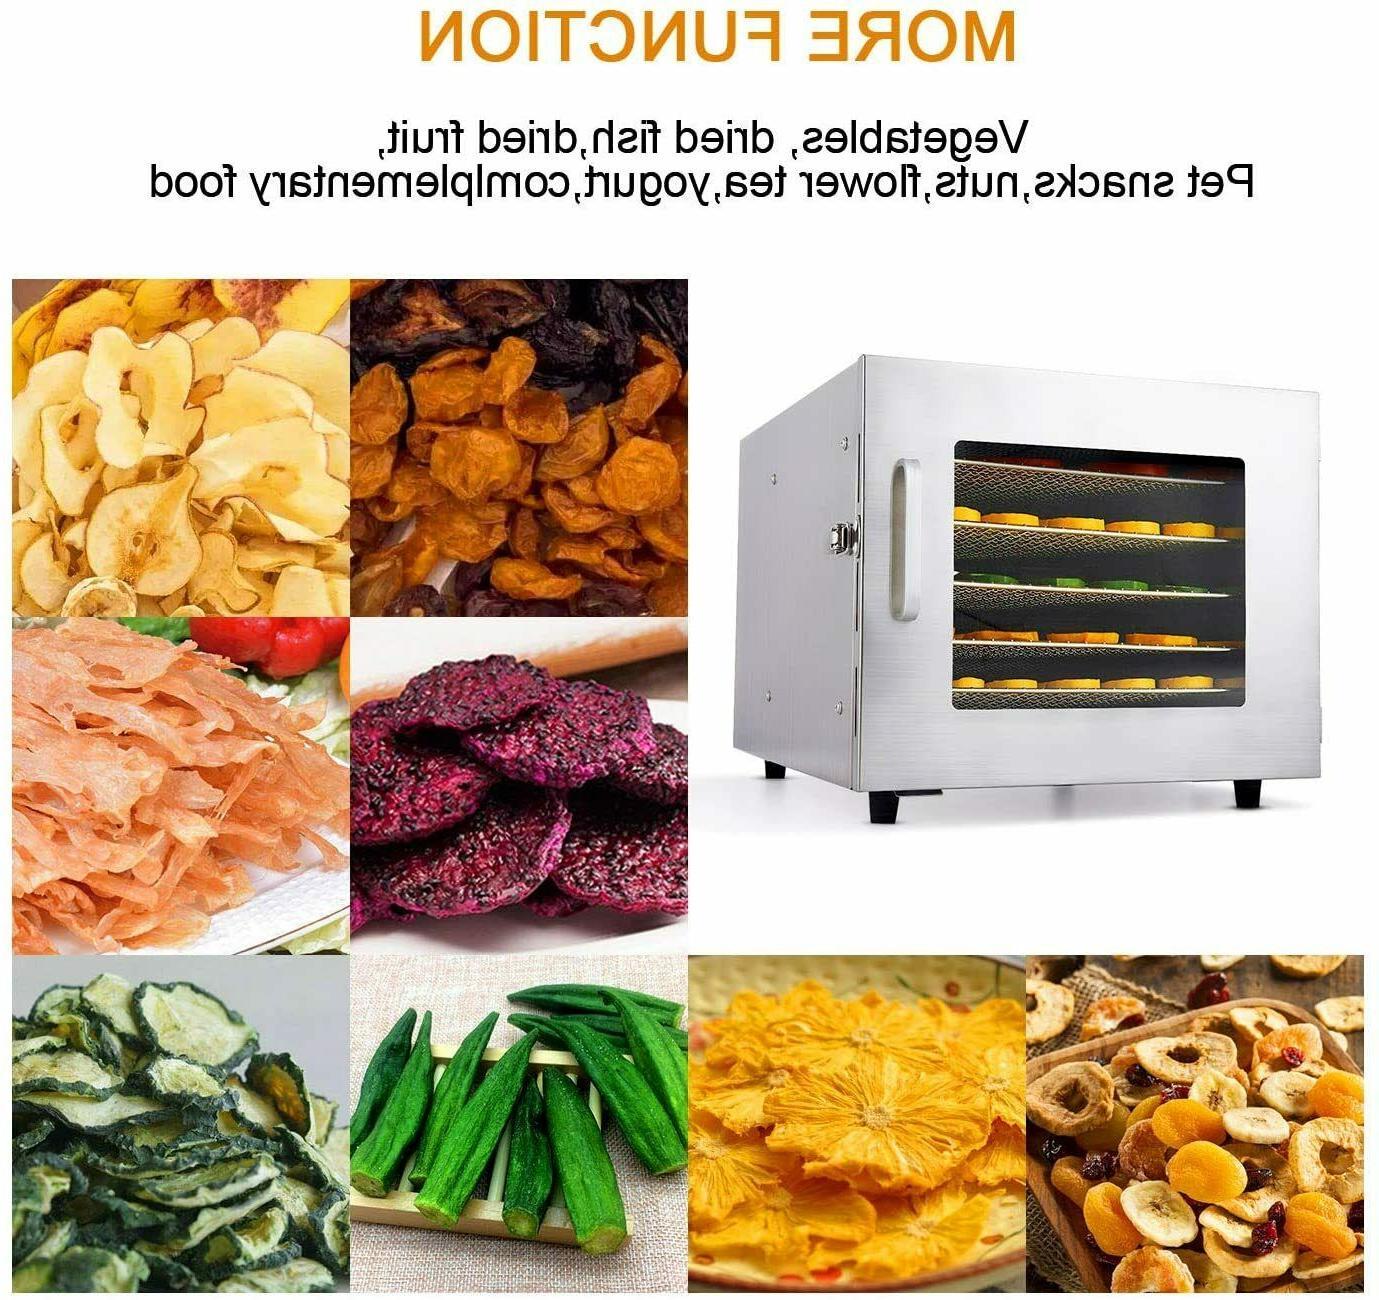 6 Tray Fruit Vegetable Preserver Commercial